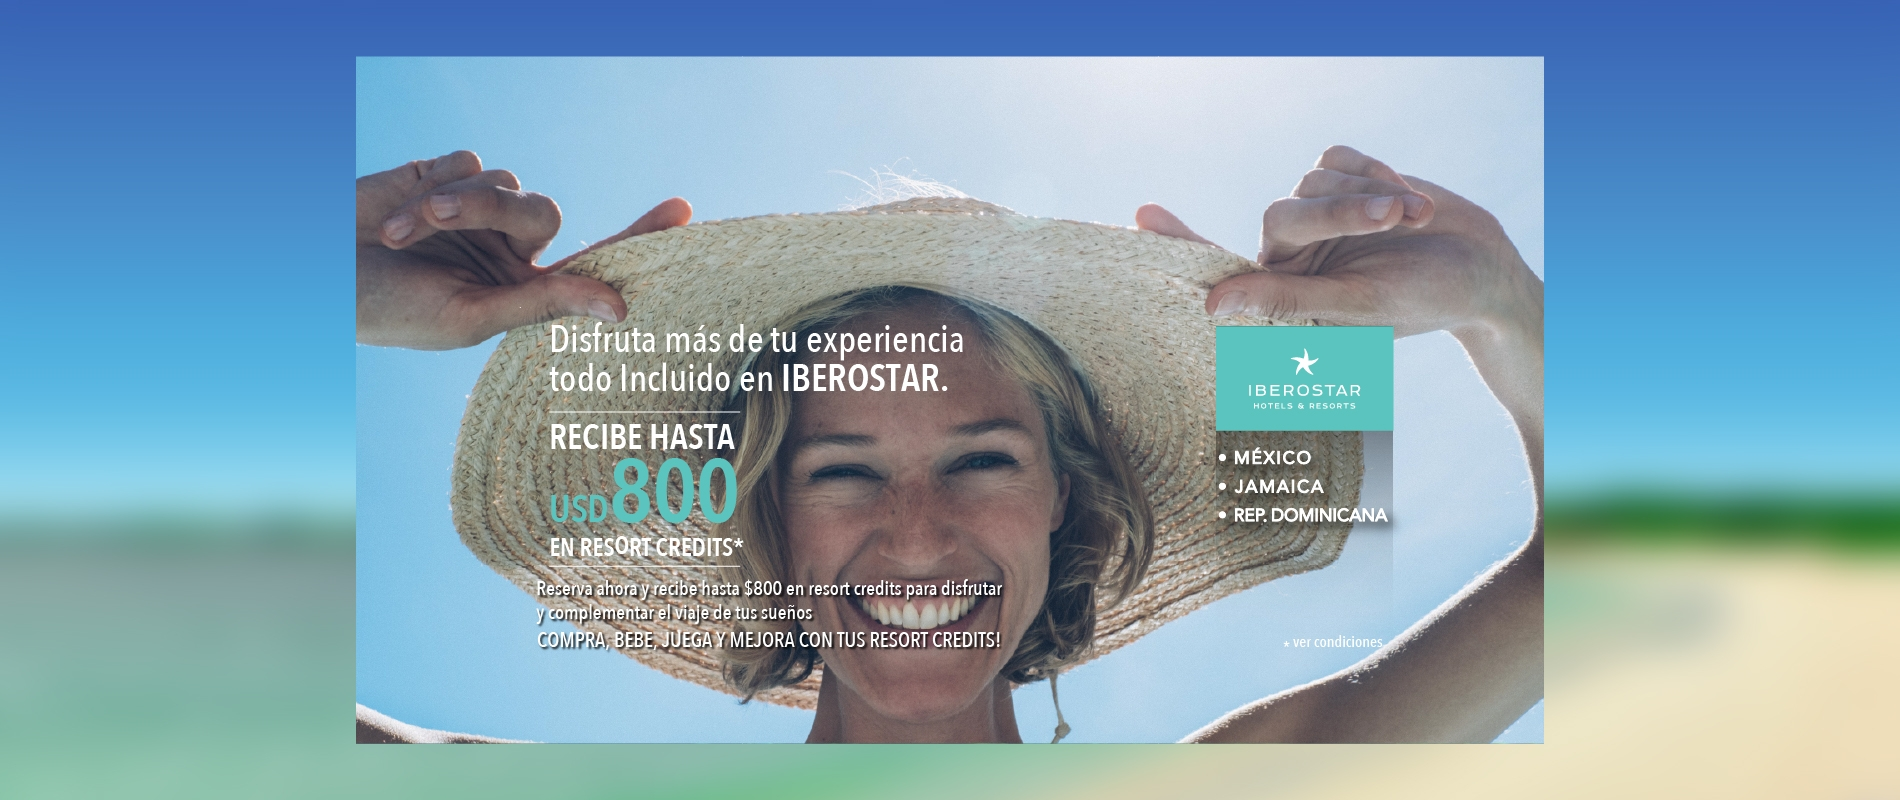 resorts credit iberostar1